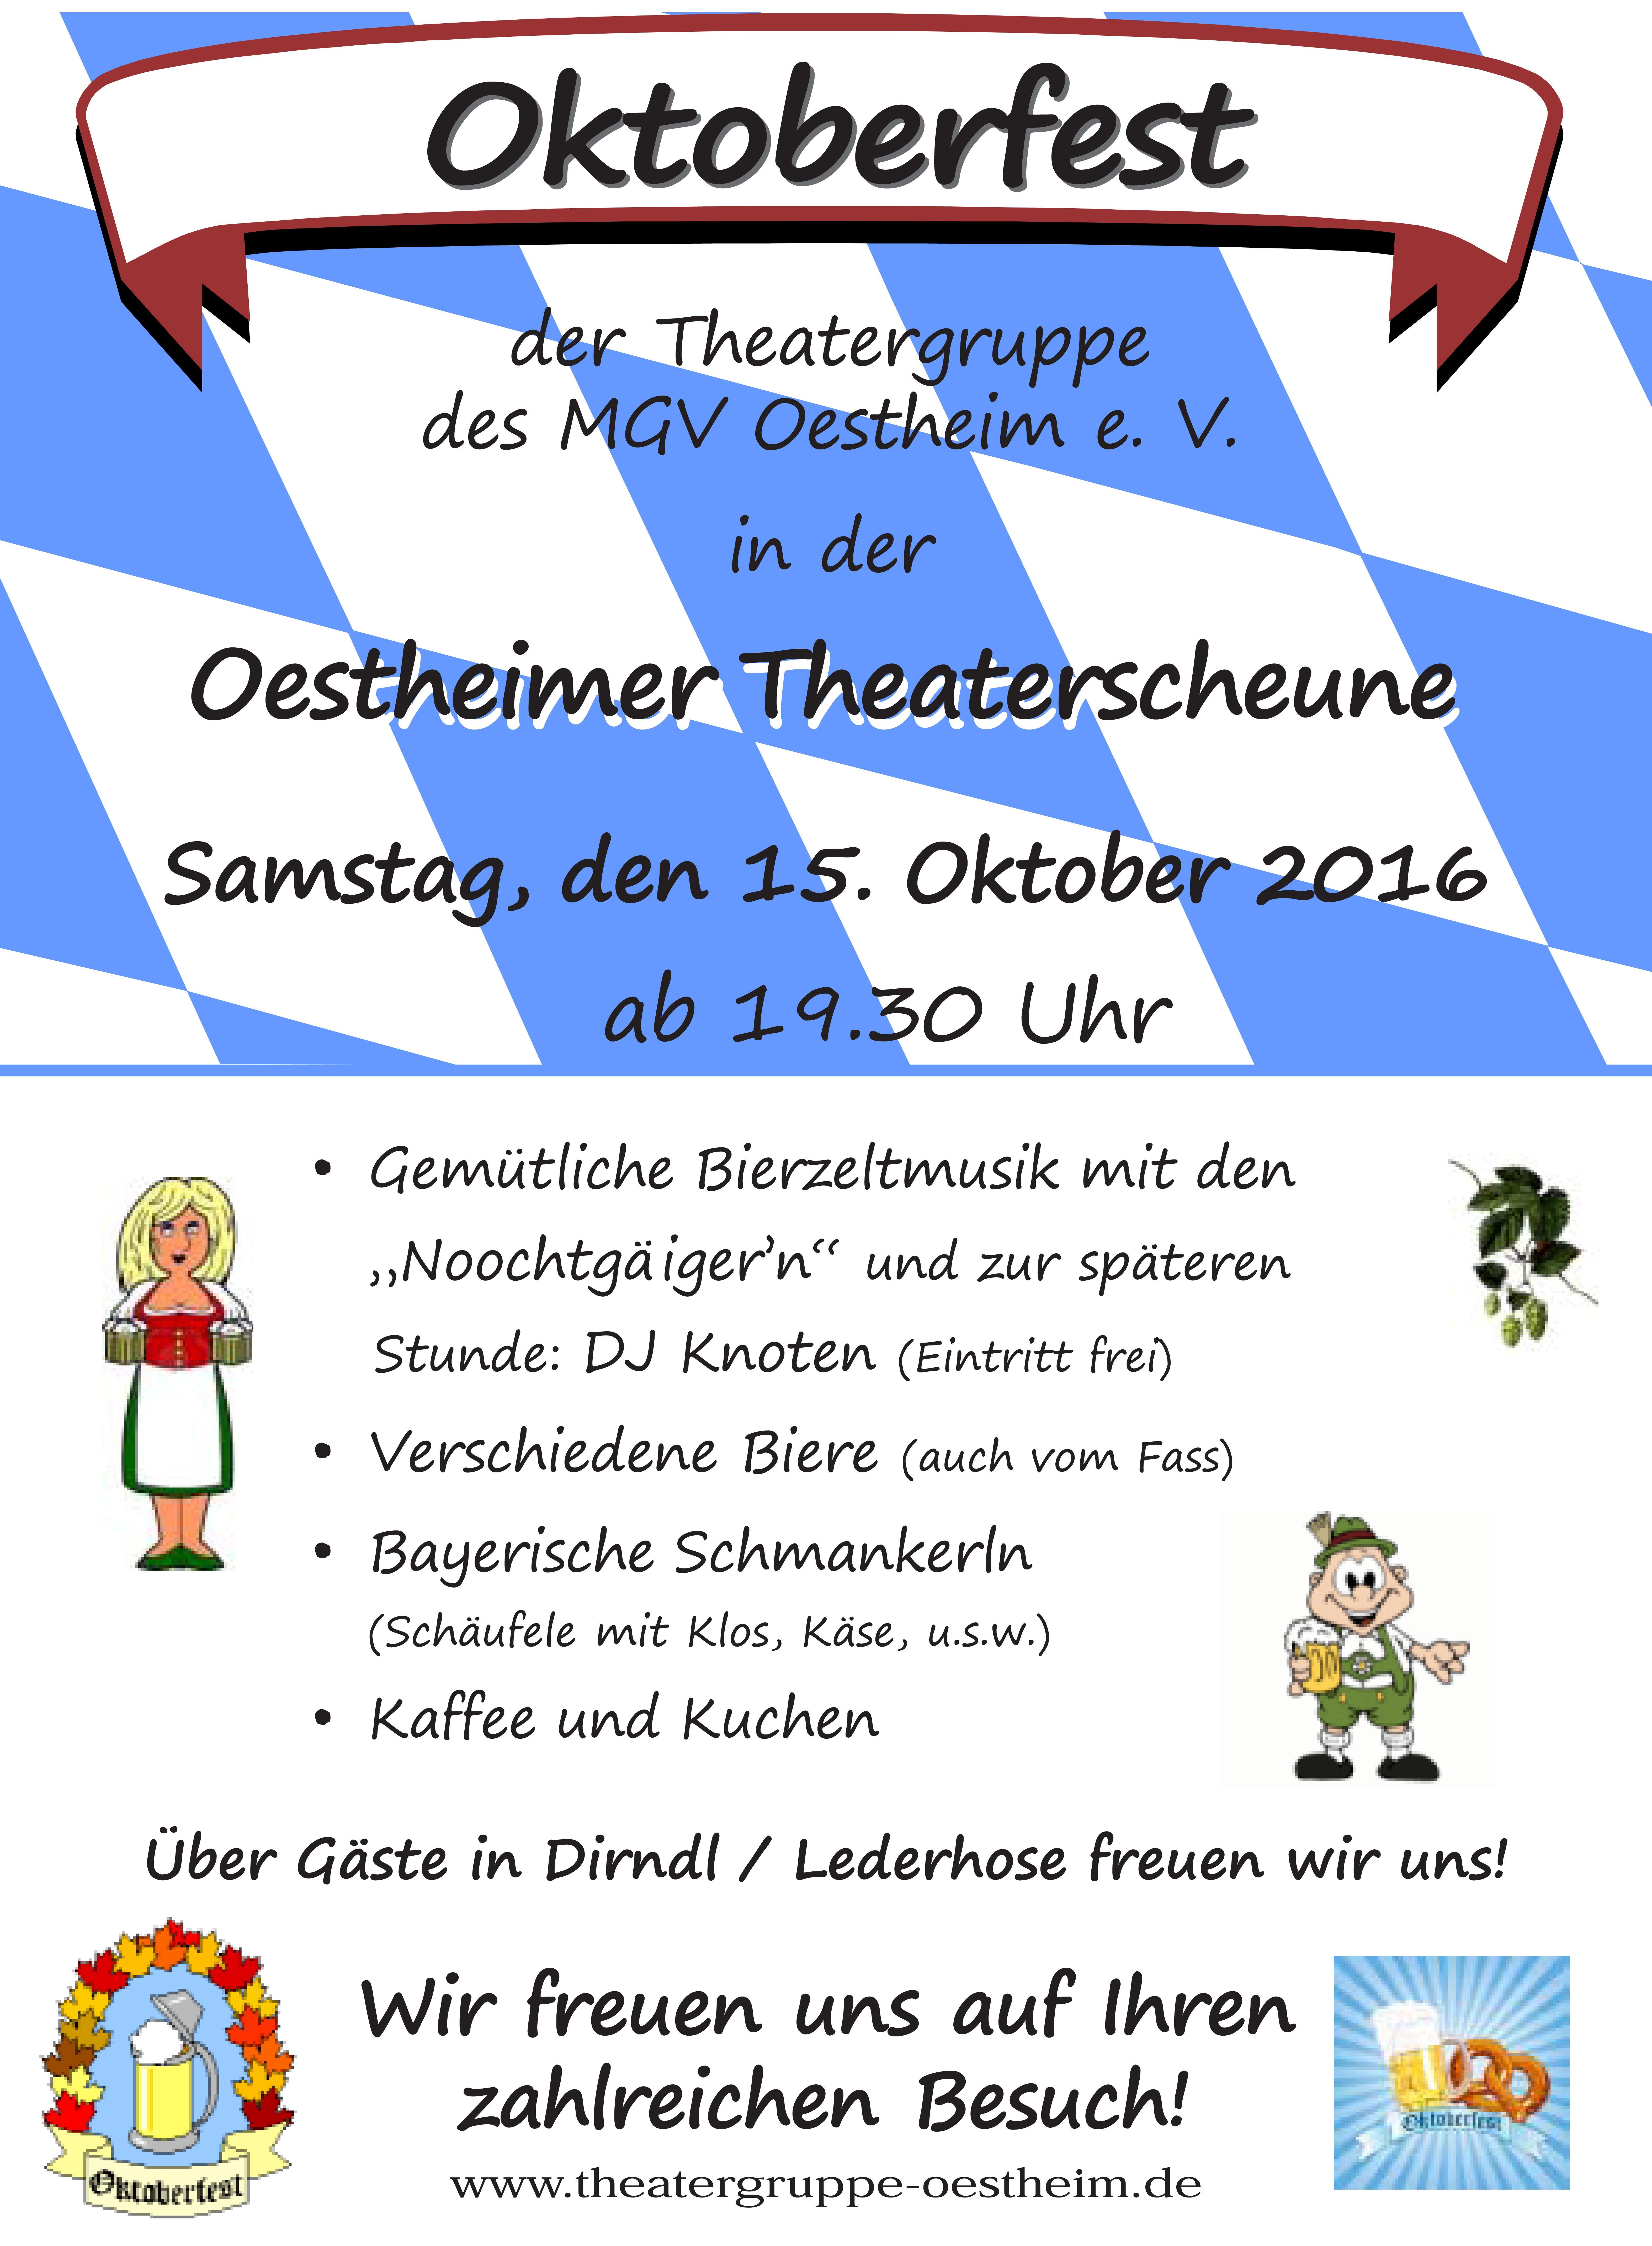 oestheimeroktoberfest2016